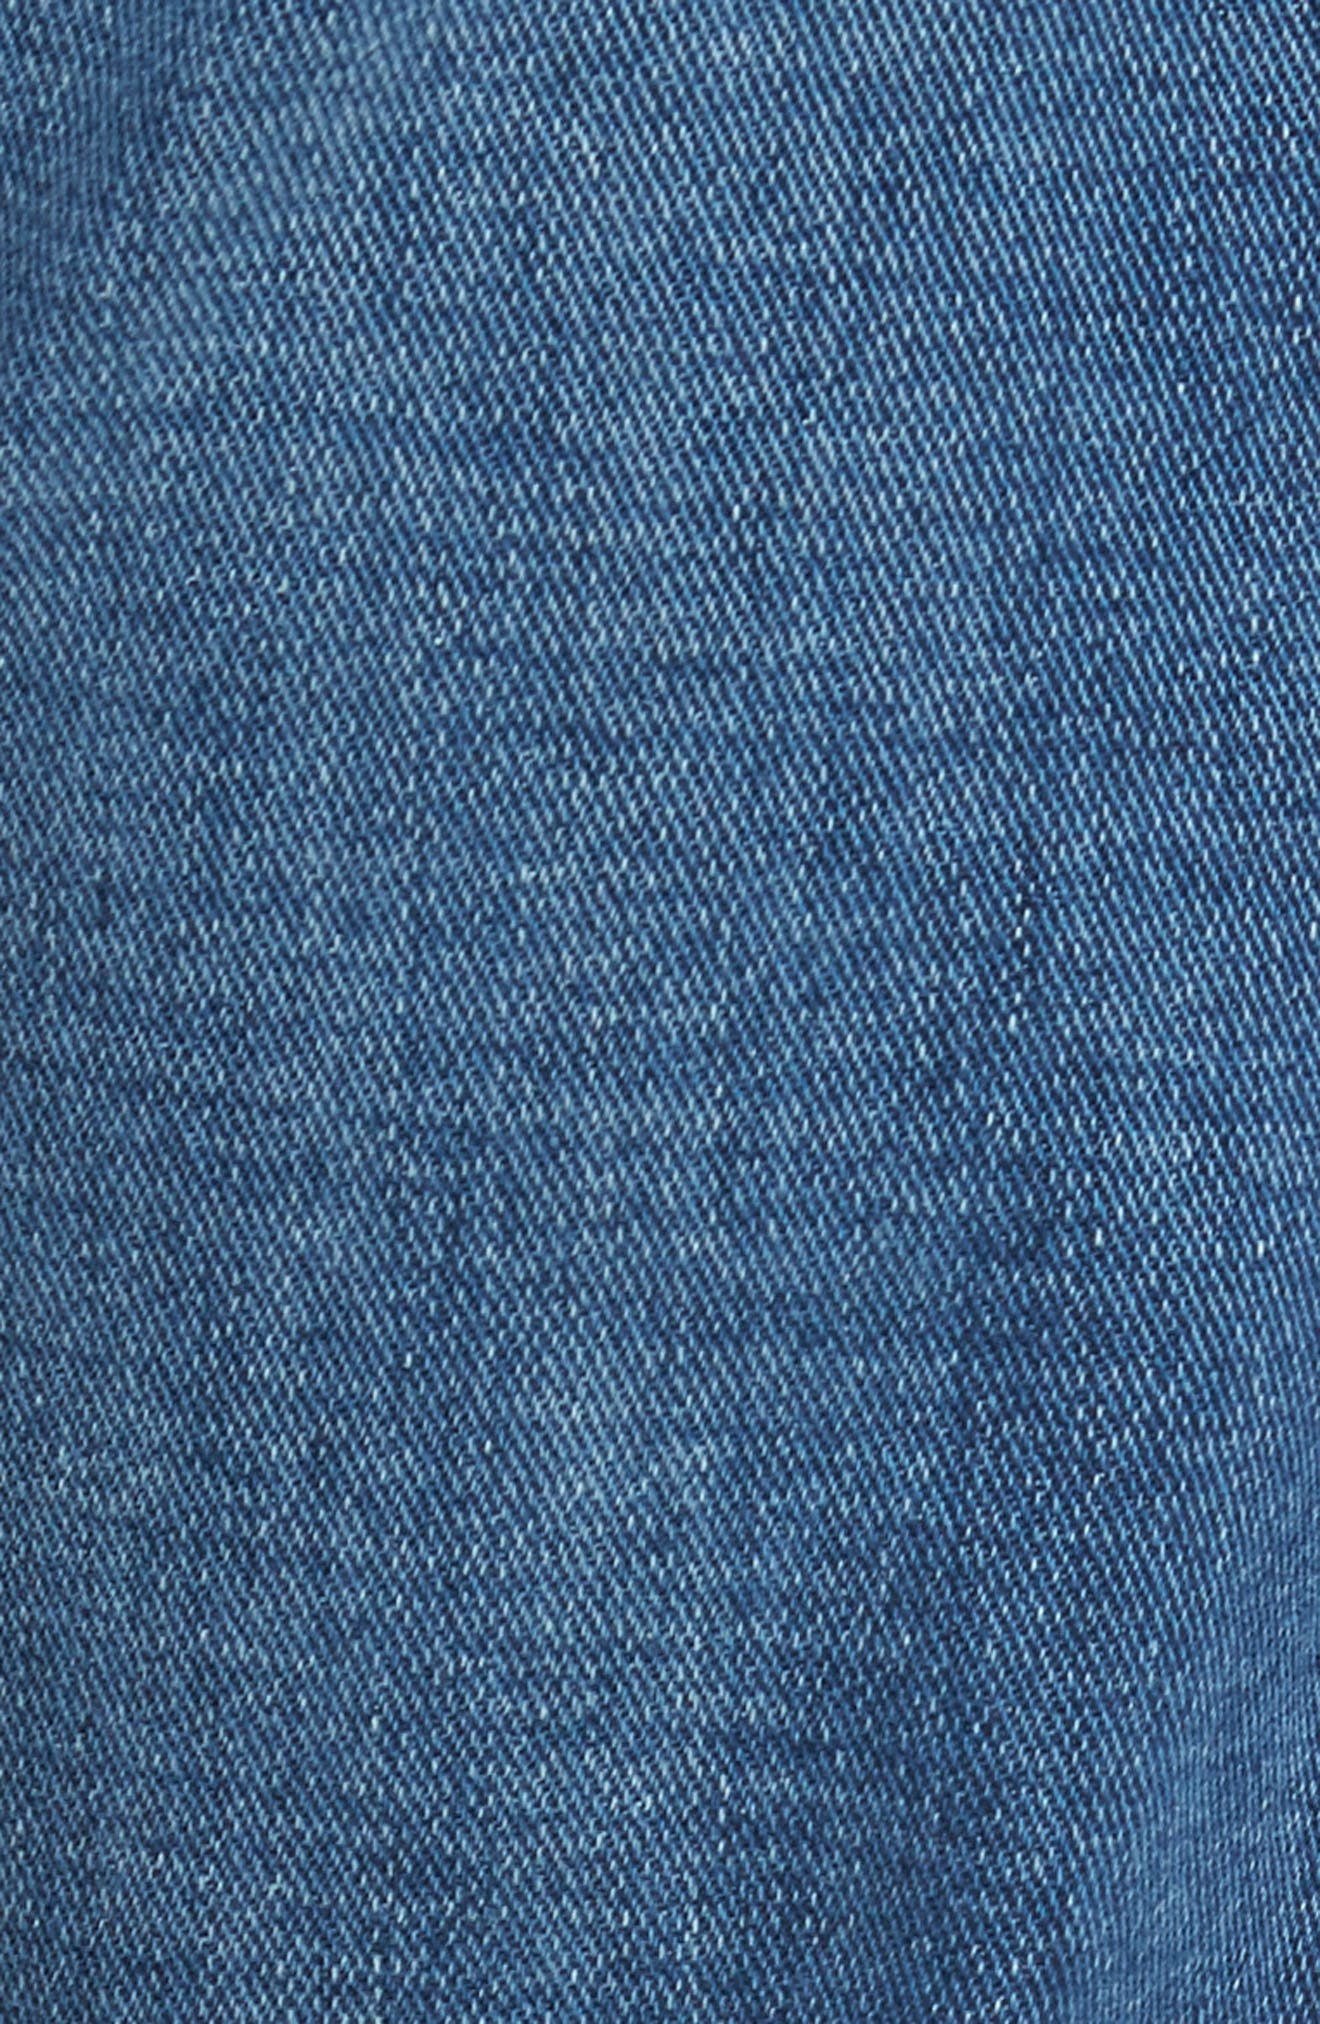 7 FOR ALL MANKIND<SUP>®</SUP>, Straight Slim Straight Leg Jeans, Alternate thumbnail 6, color, LYNNWOOD-LYNN